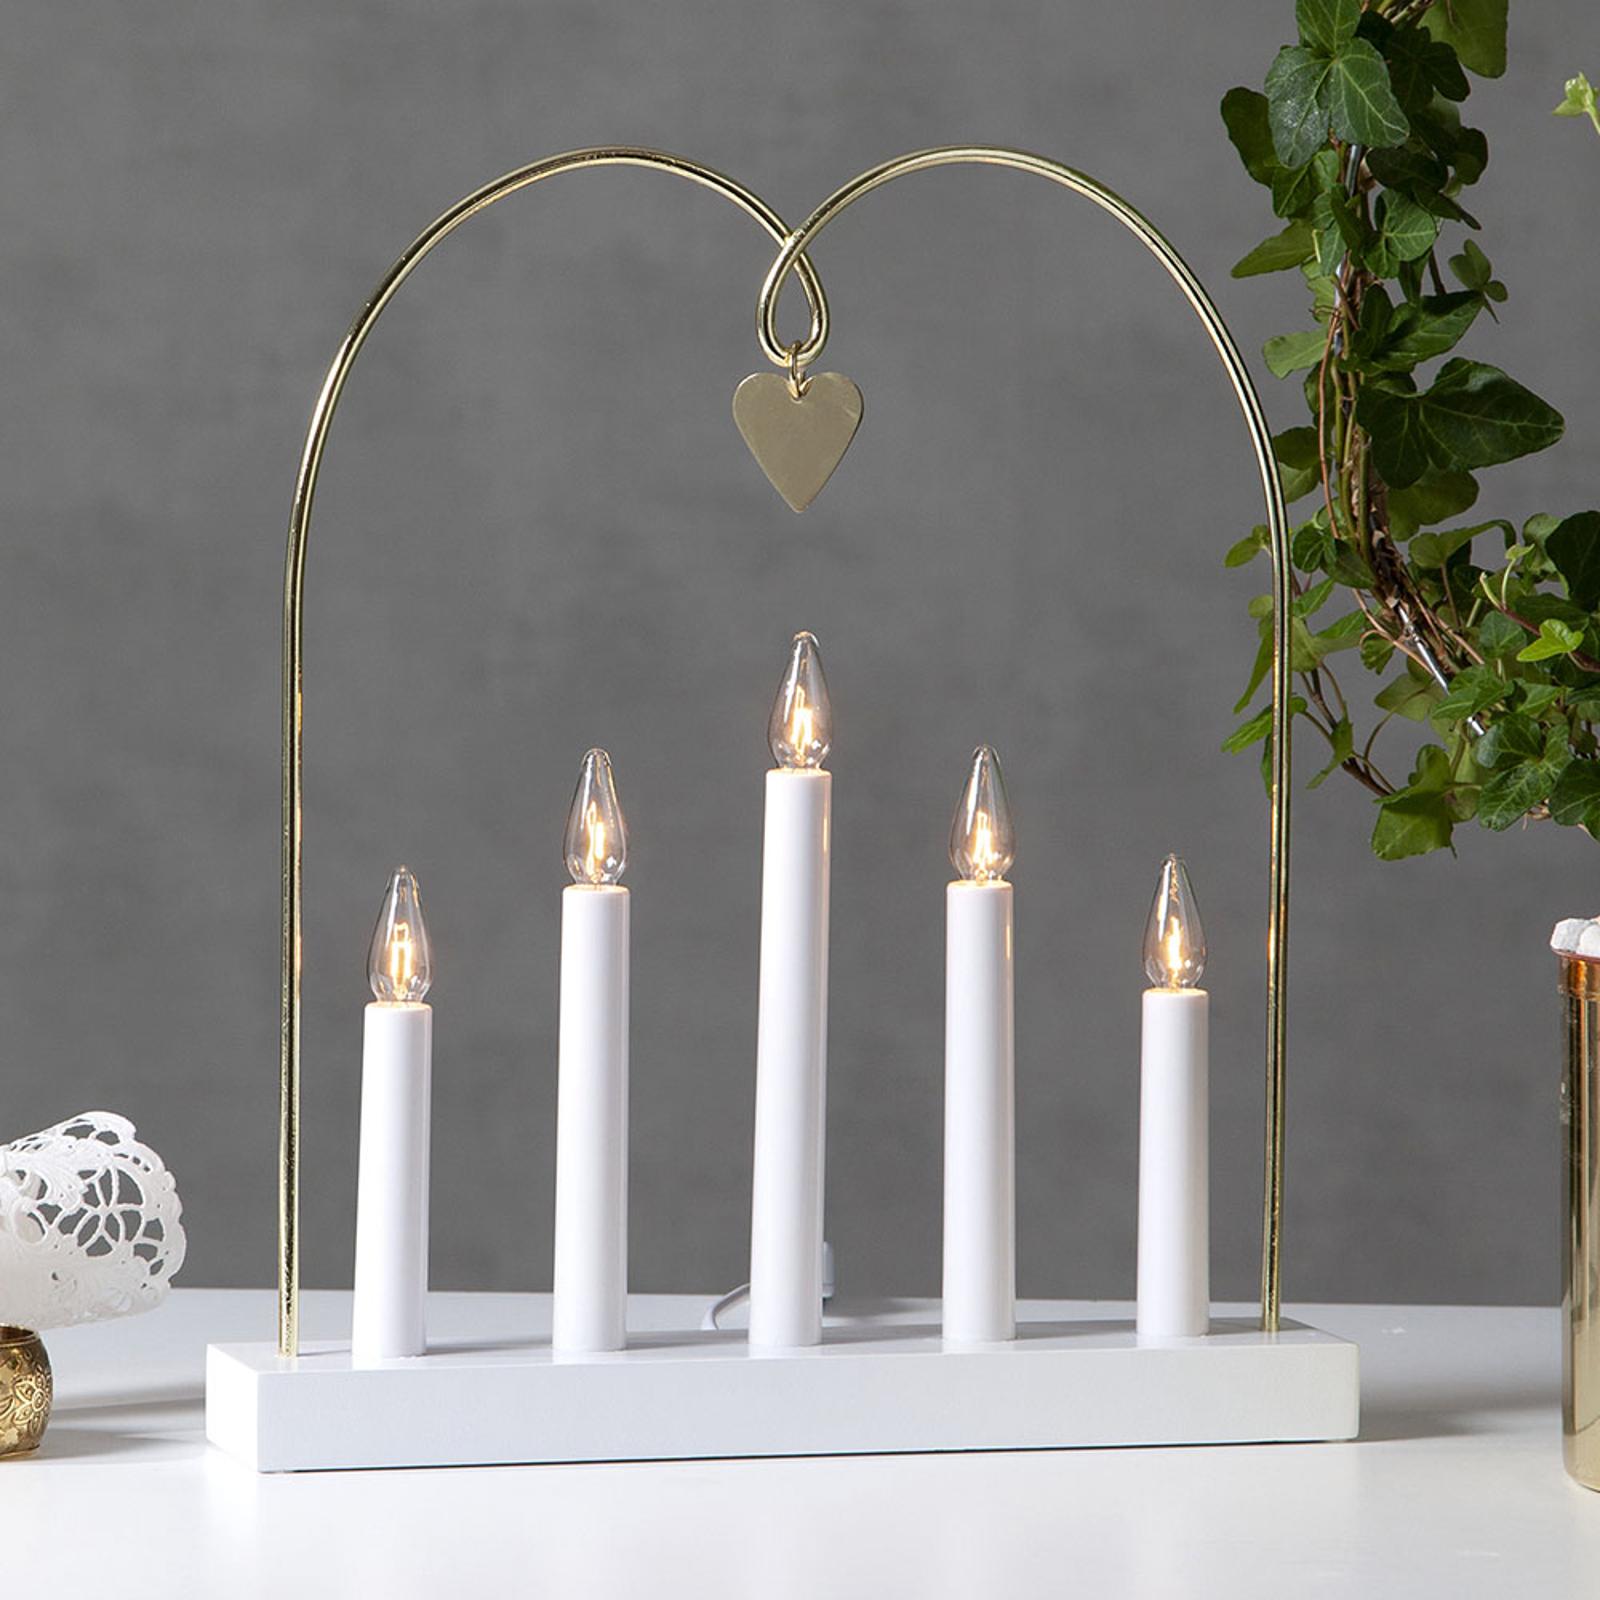 Vinduslampe Glossy, bue, 5 lyskilder, hvit